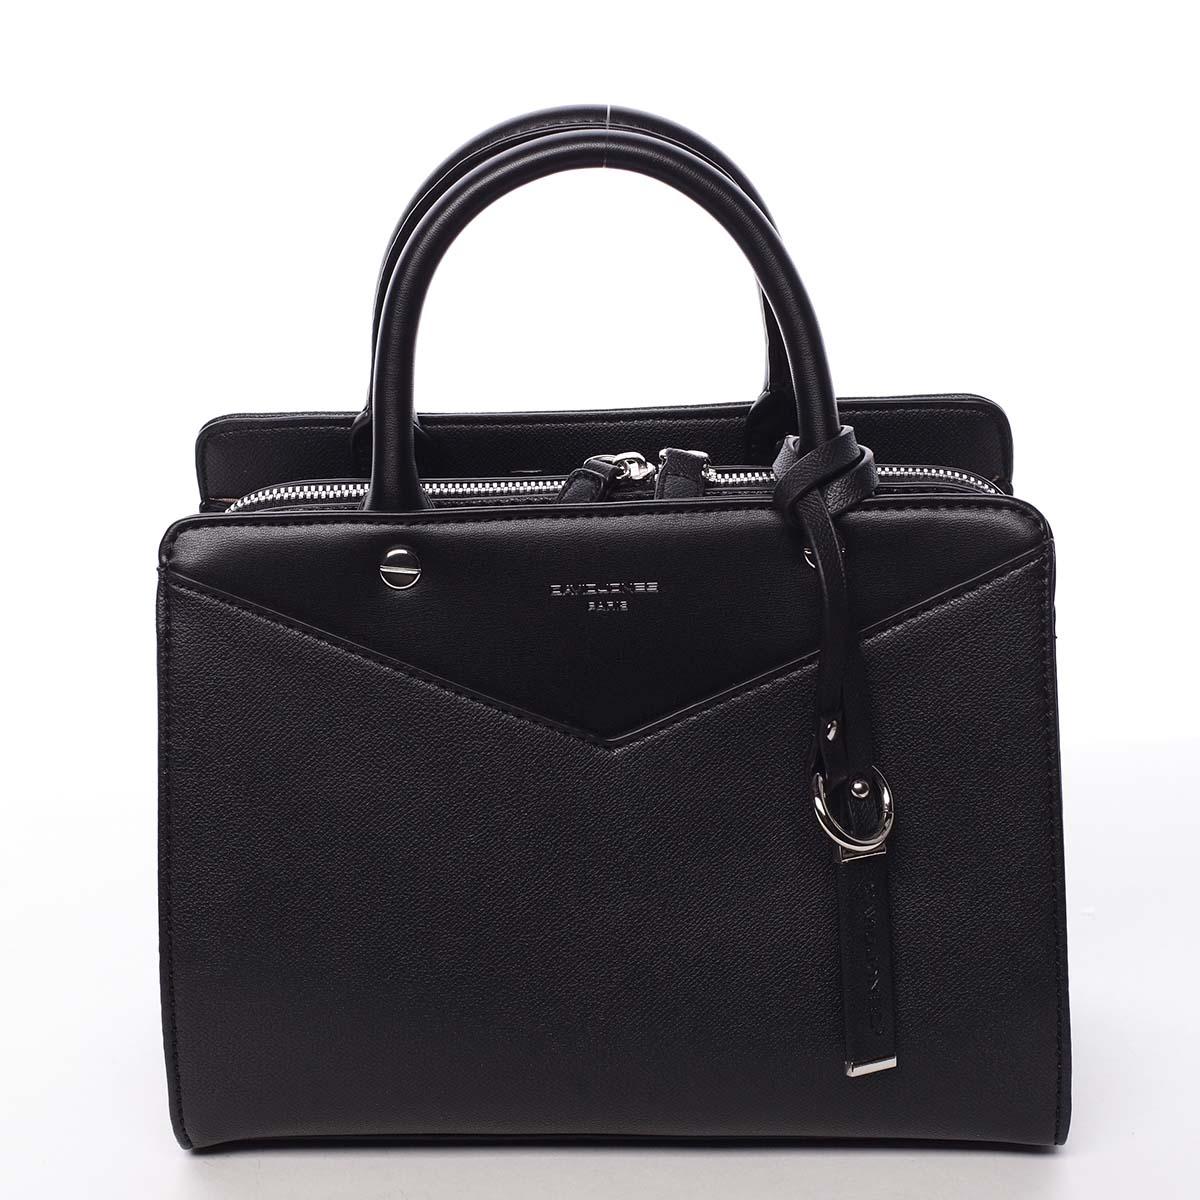 Dámska kabelka do ruky čierna - David Jones Angela čierna